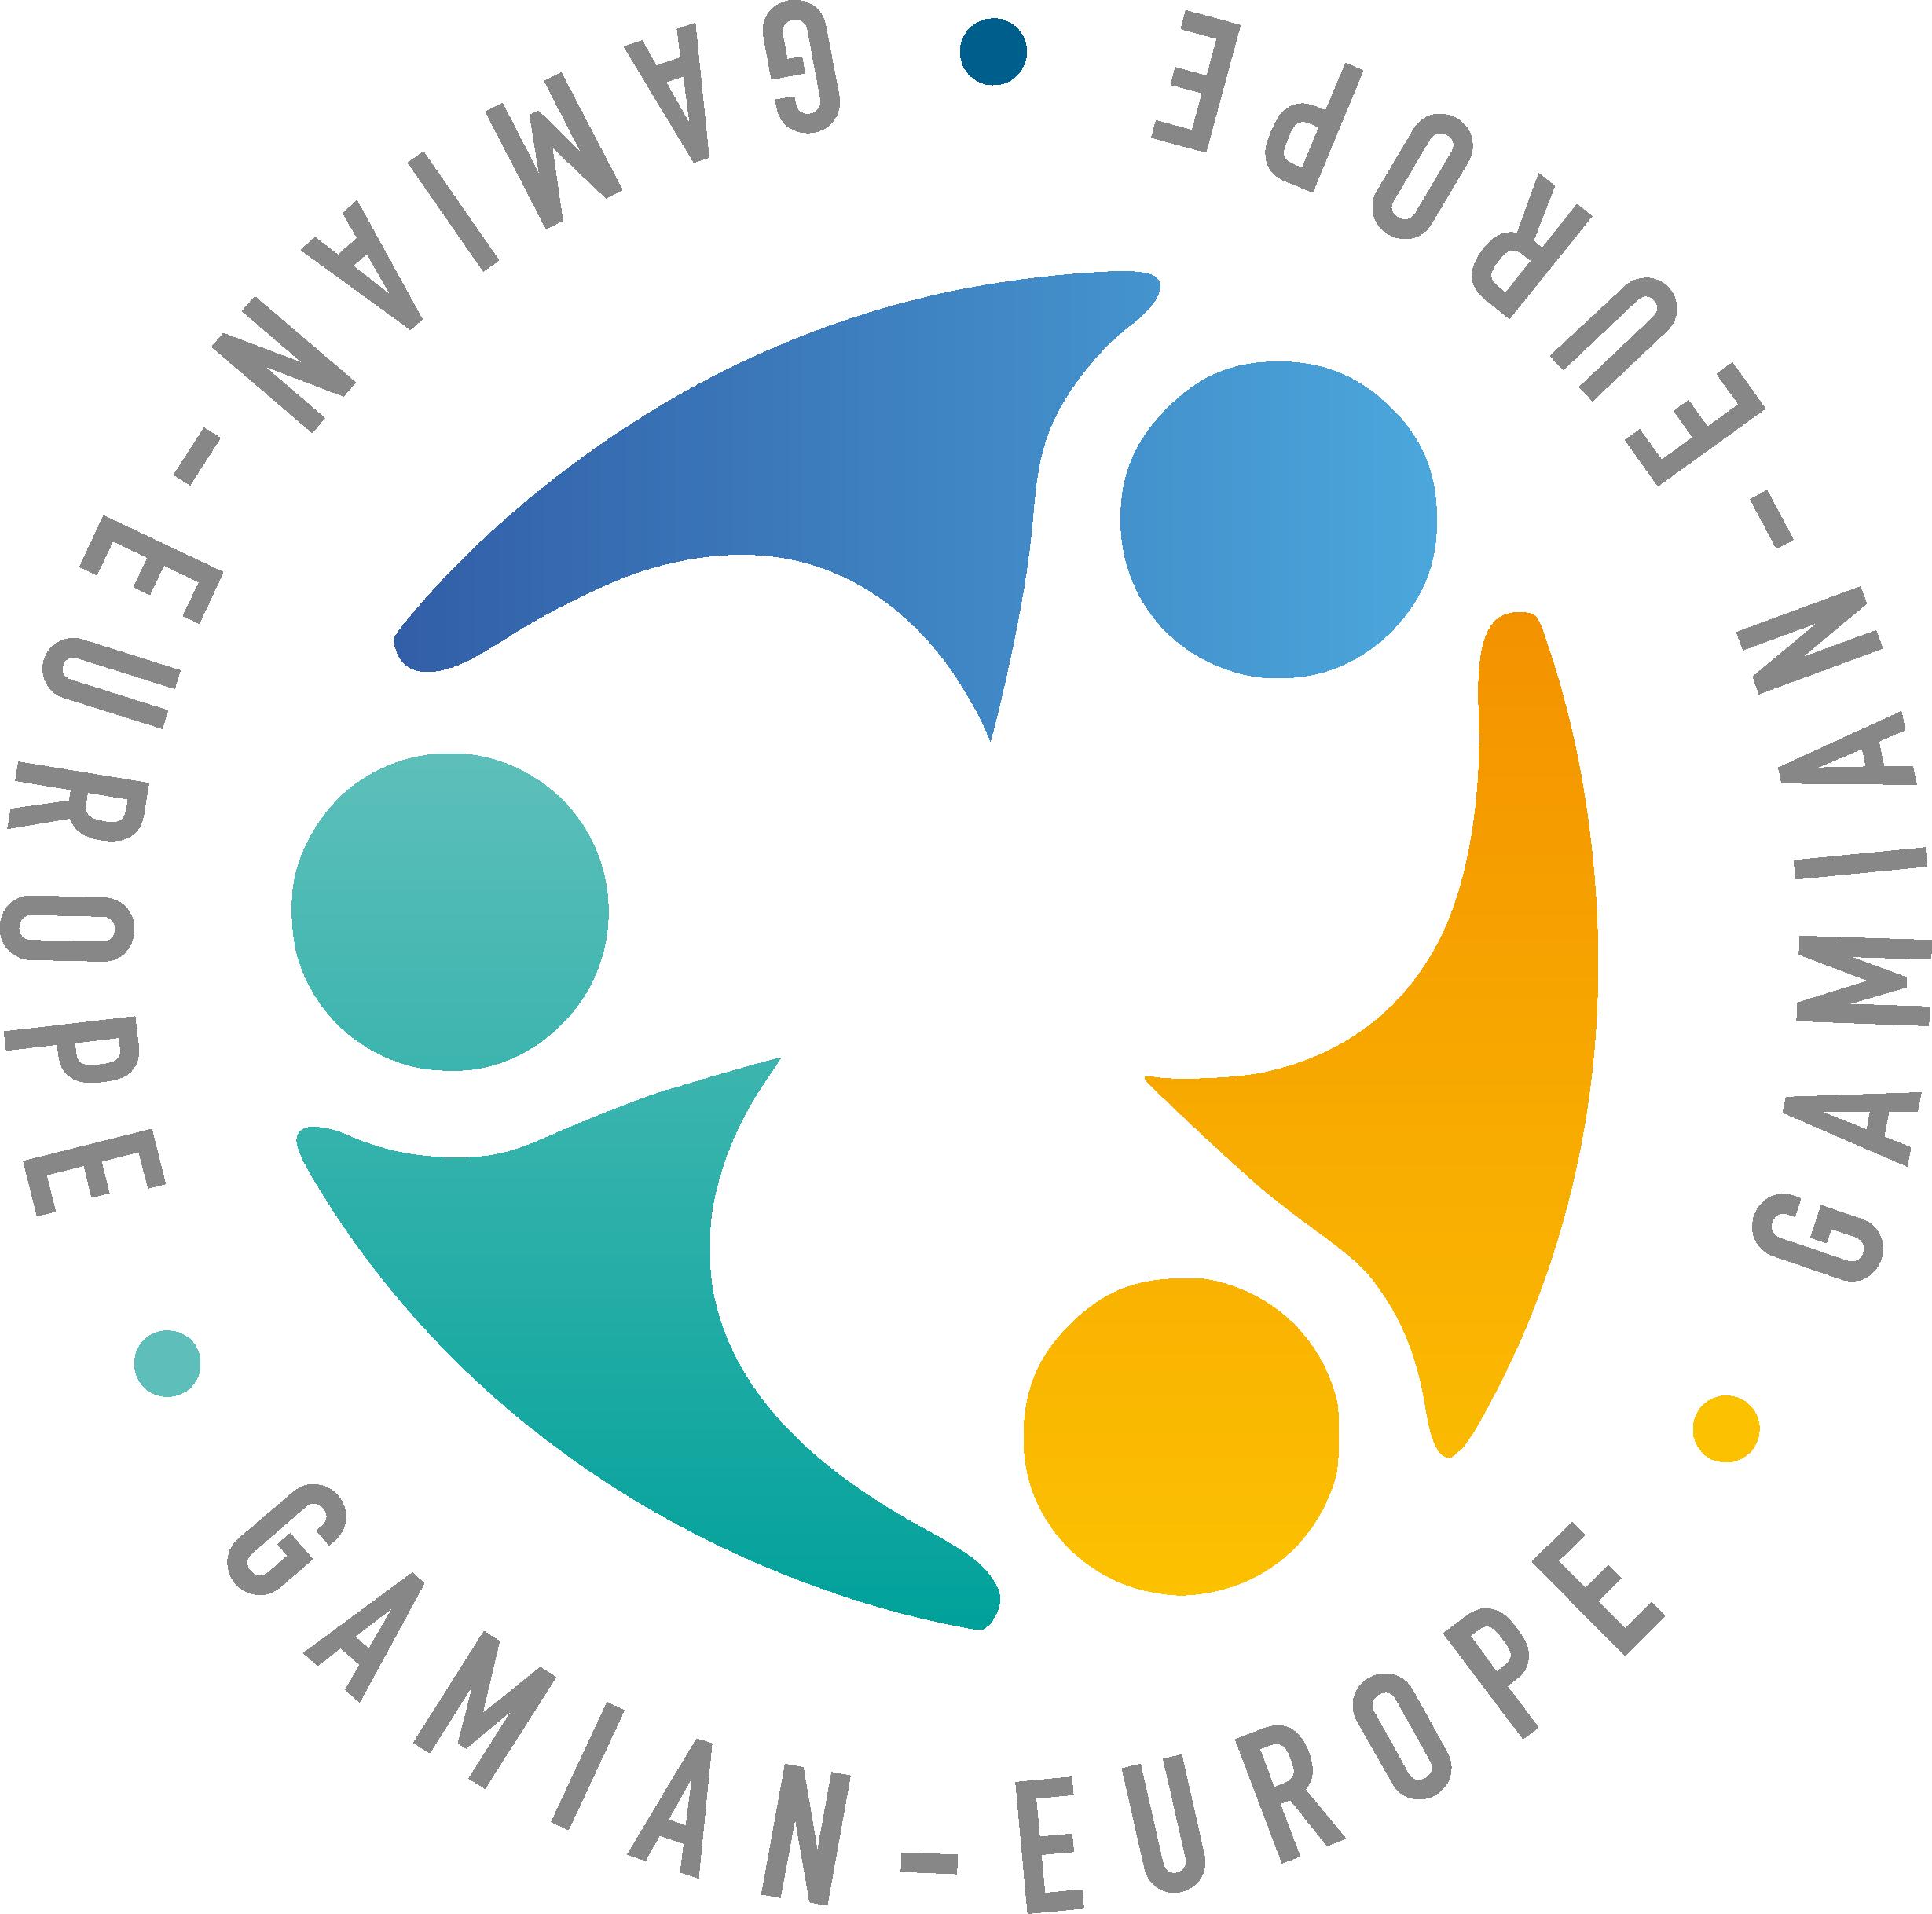 Gamian logo